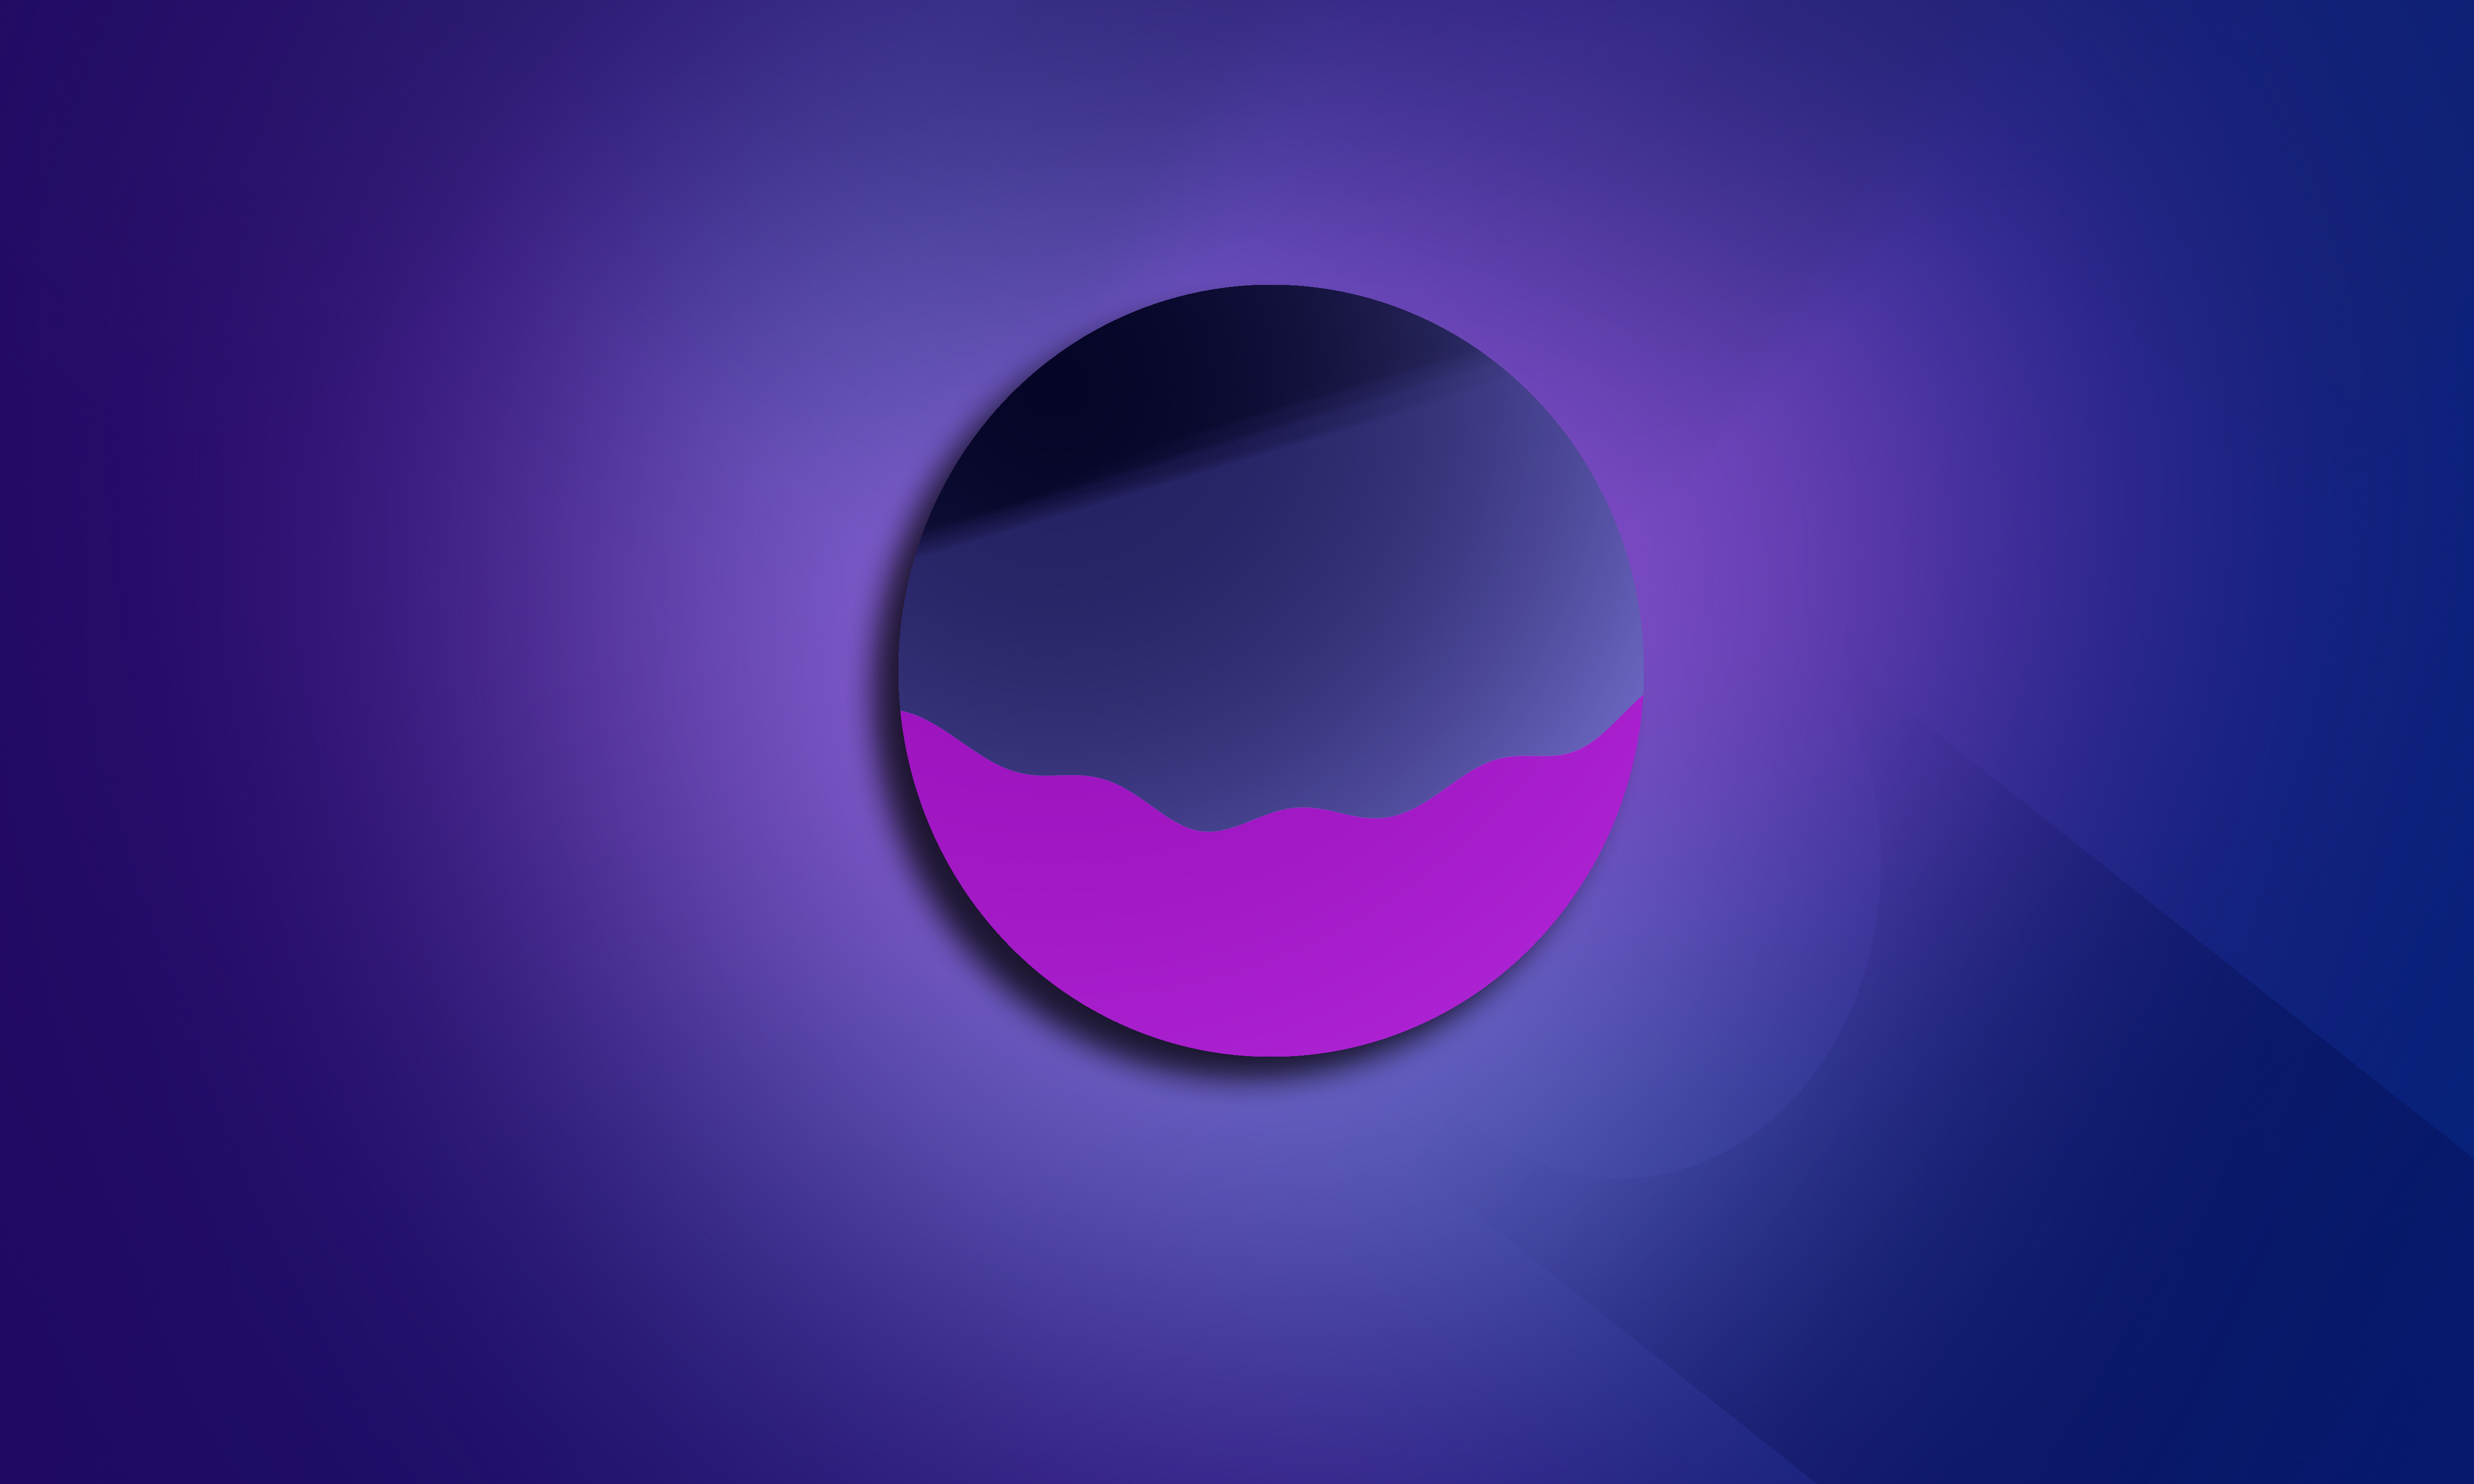 purple planet 1578254981 - Purple Planet -